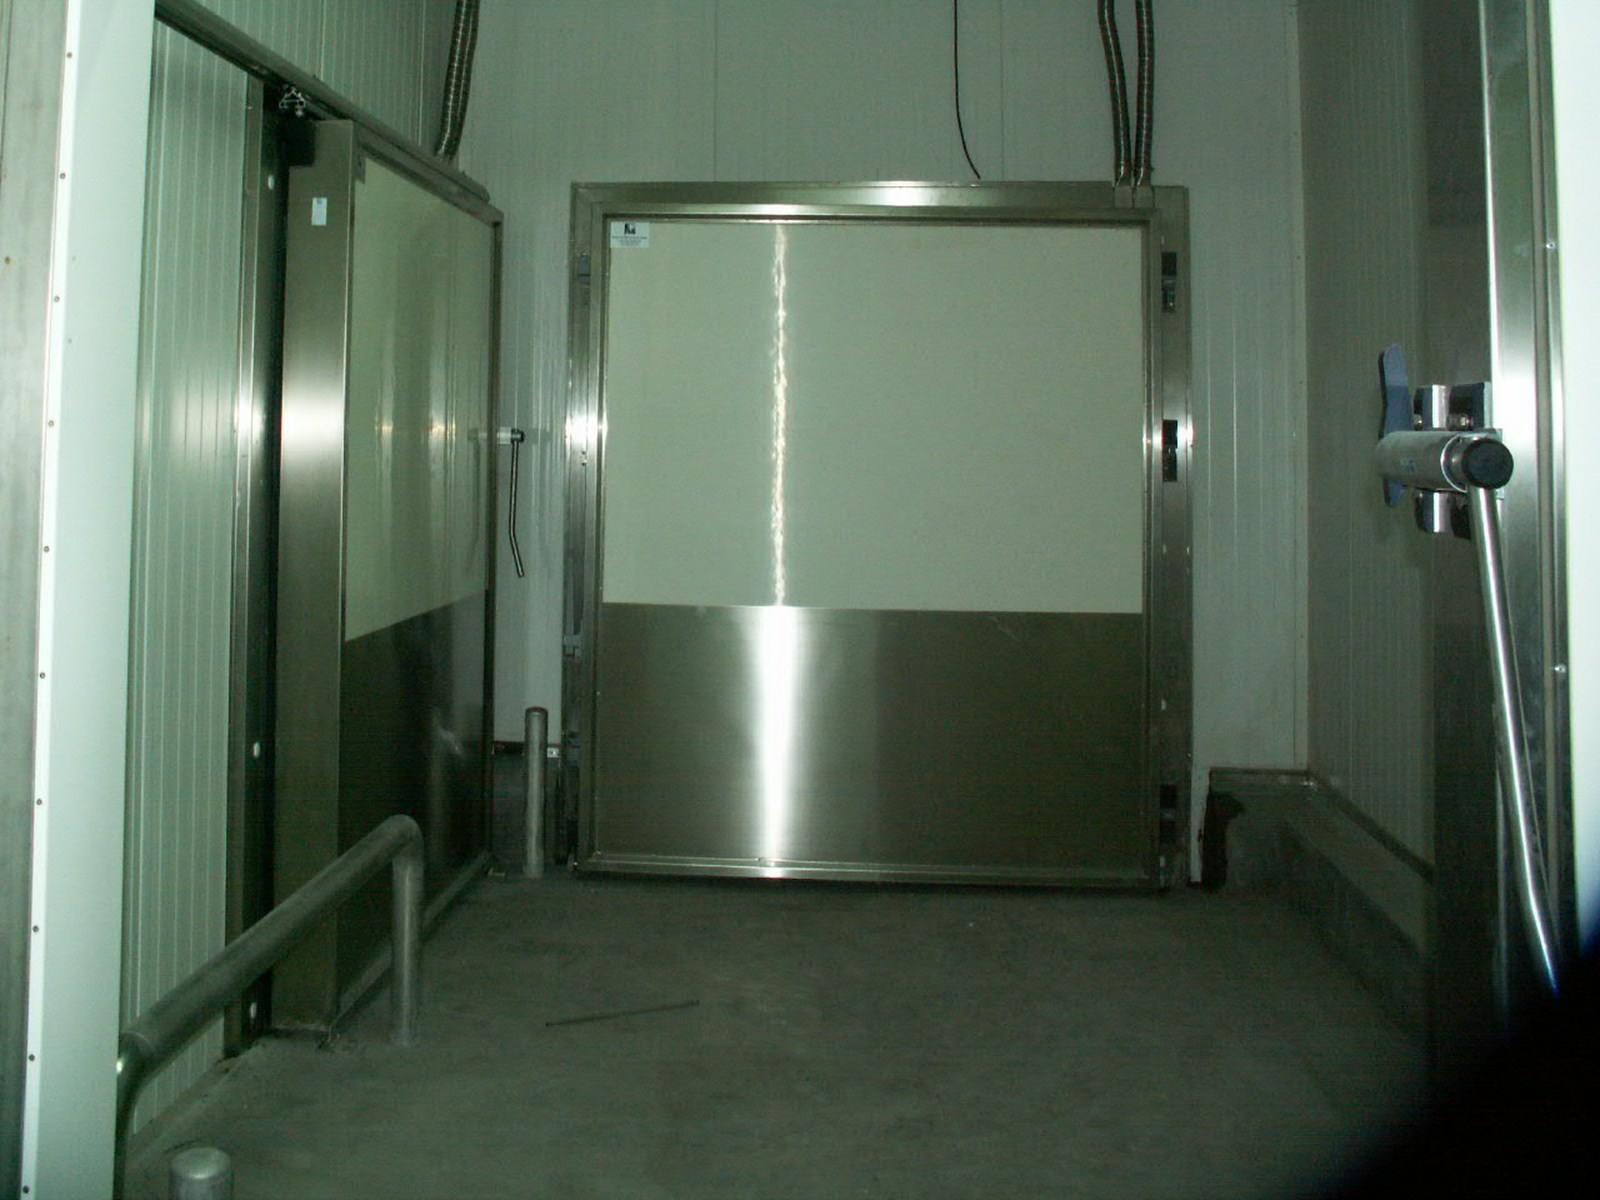 Porte coulissante de refrigeration